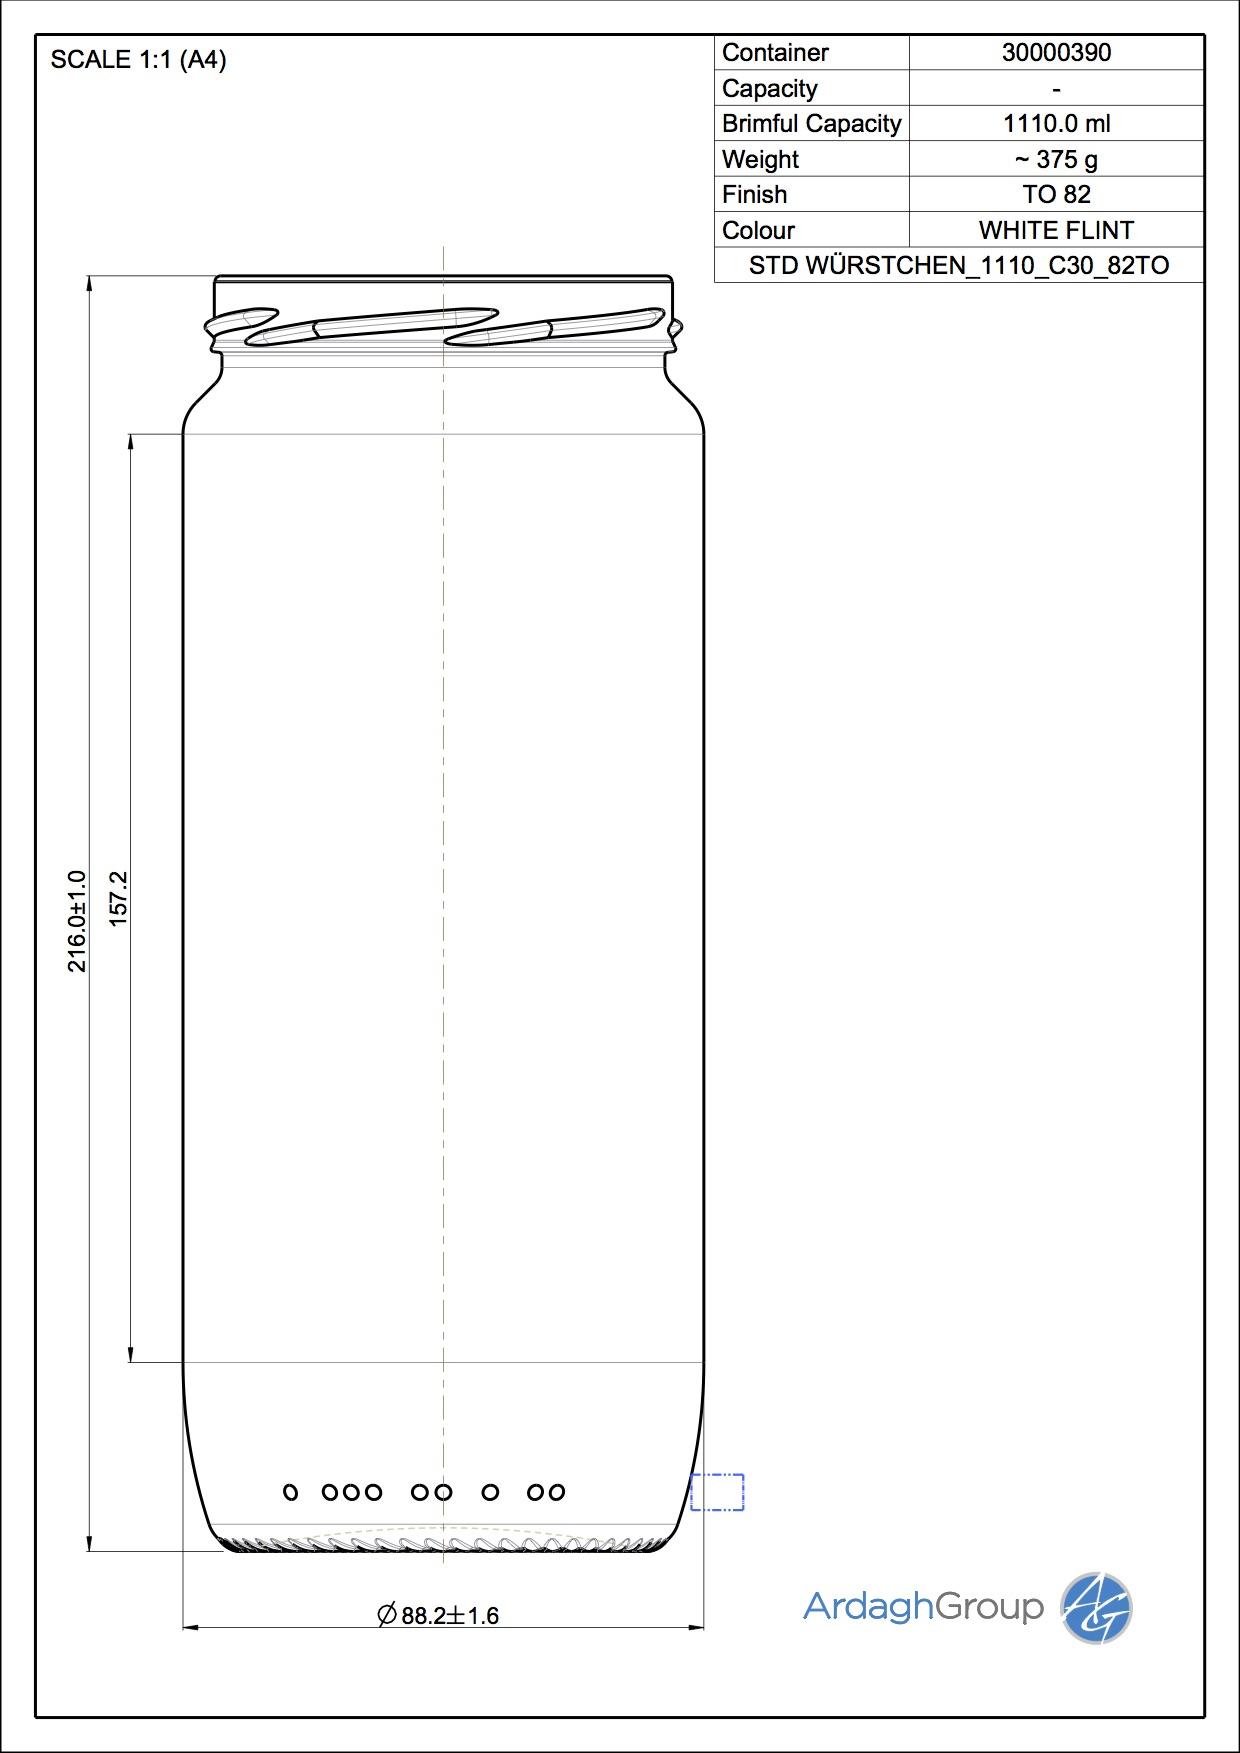 Wuerstchenglas 1110 C30 82TO